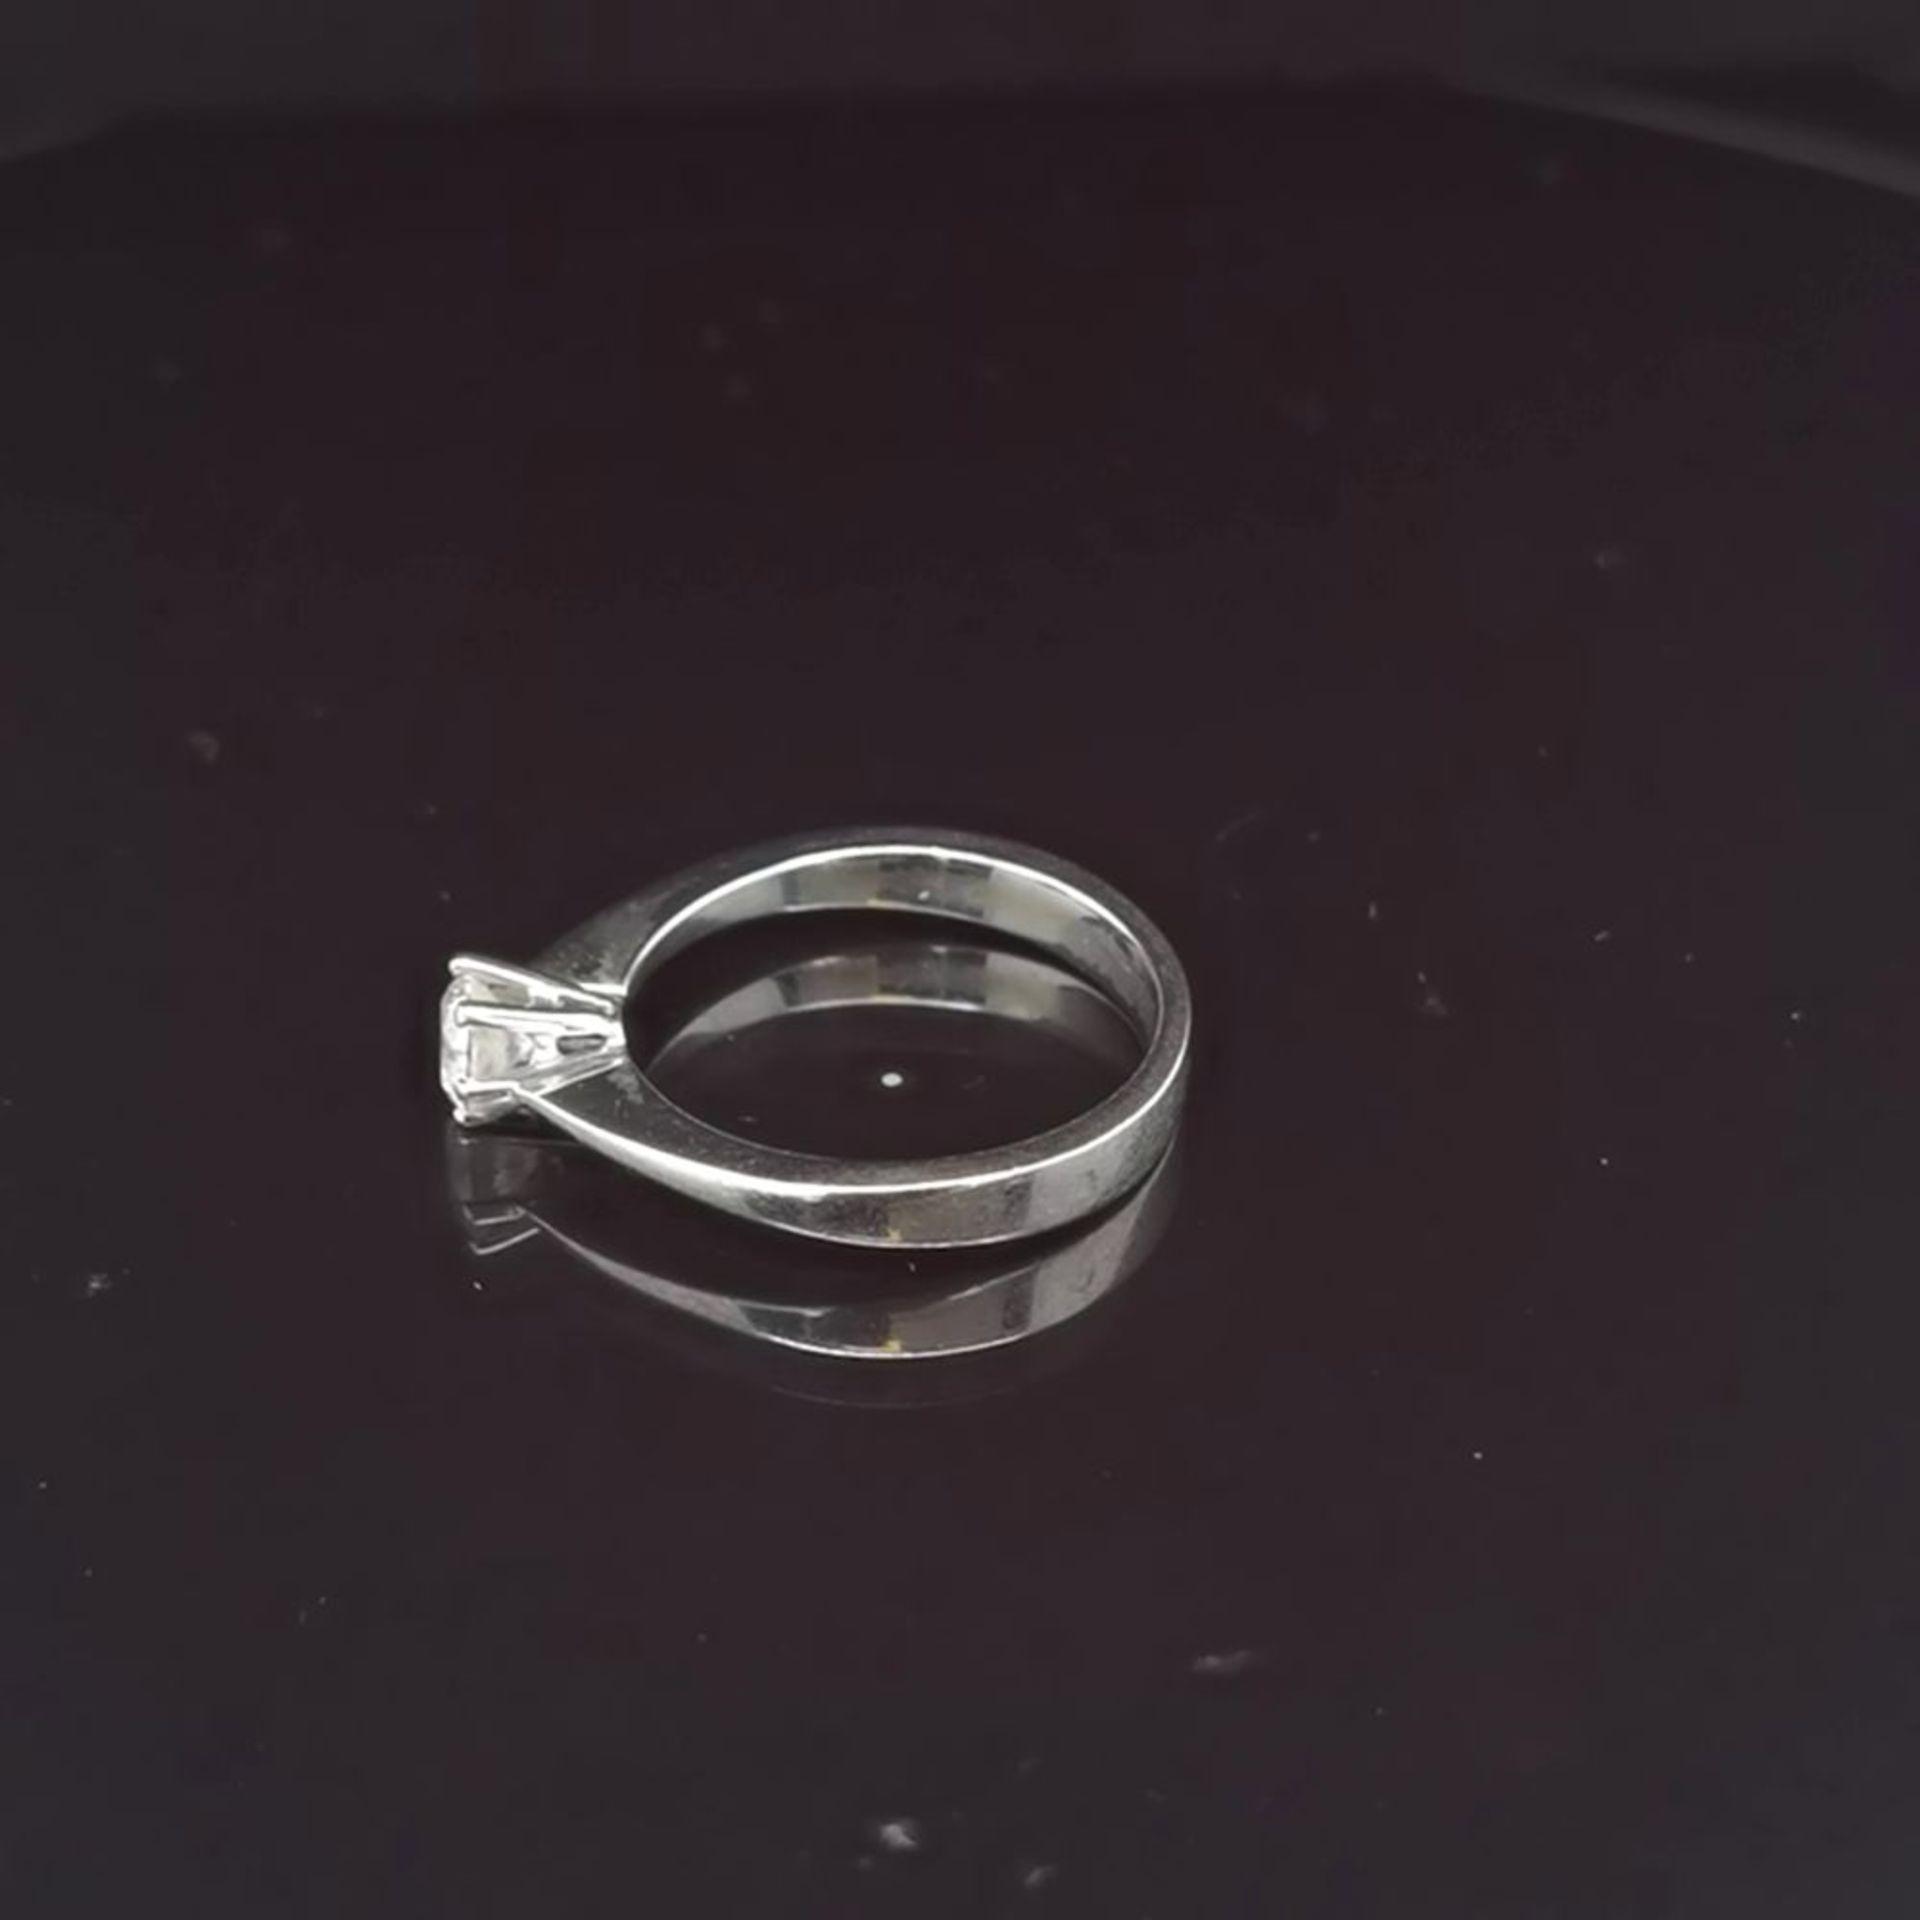 Brillant-Ring, 750 Weißgold 3,4 - Image 2 of 3